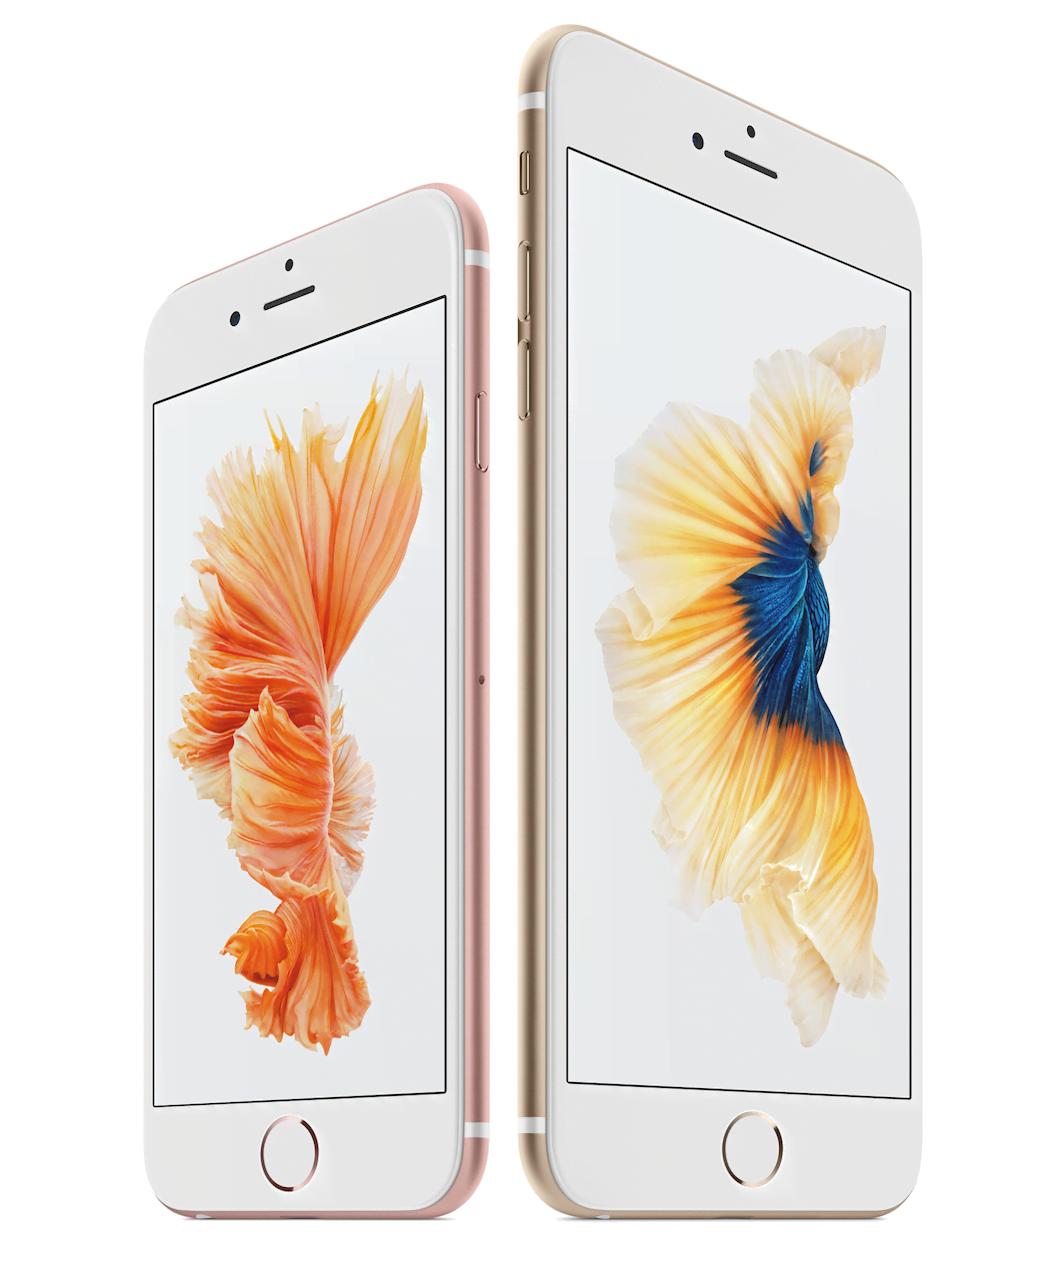 d33f5d9dc74 ... i Danmark fredag den 2. oktober. iPhone 6S og iPhone 6S Plus